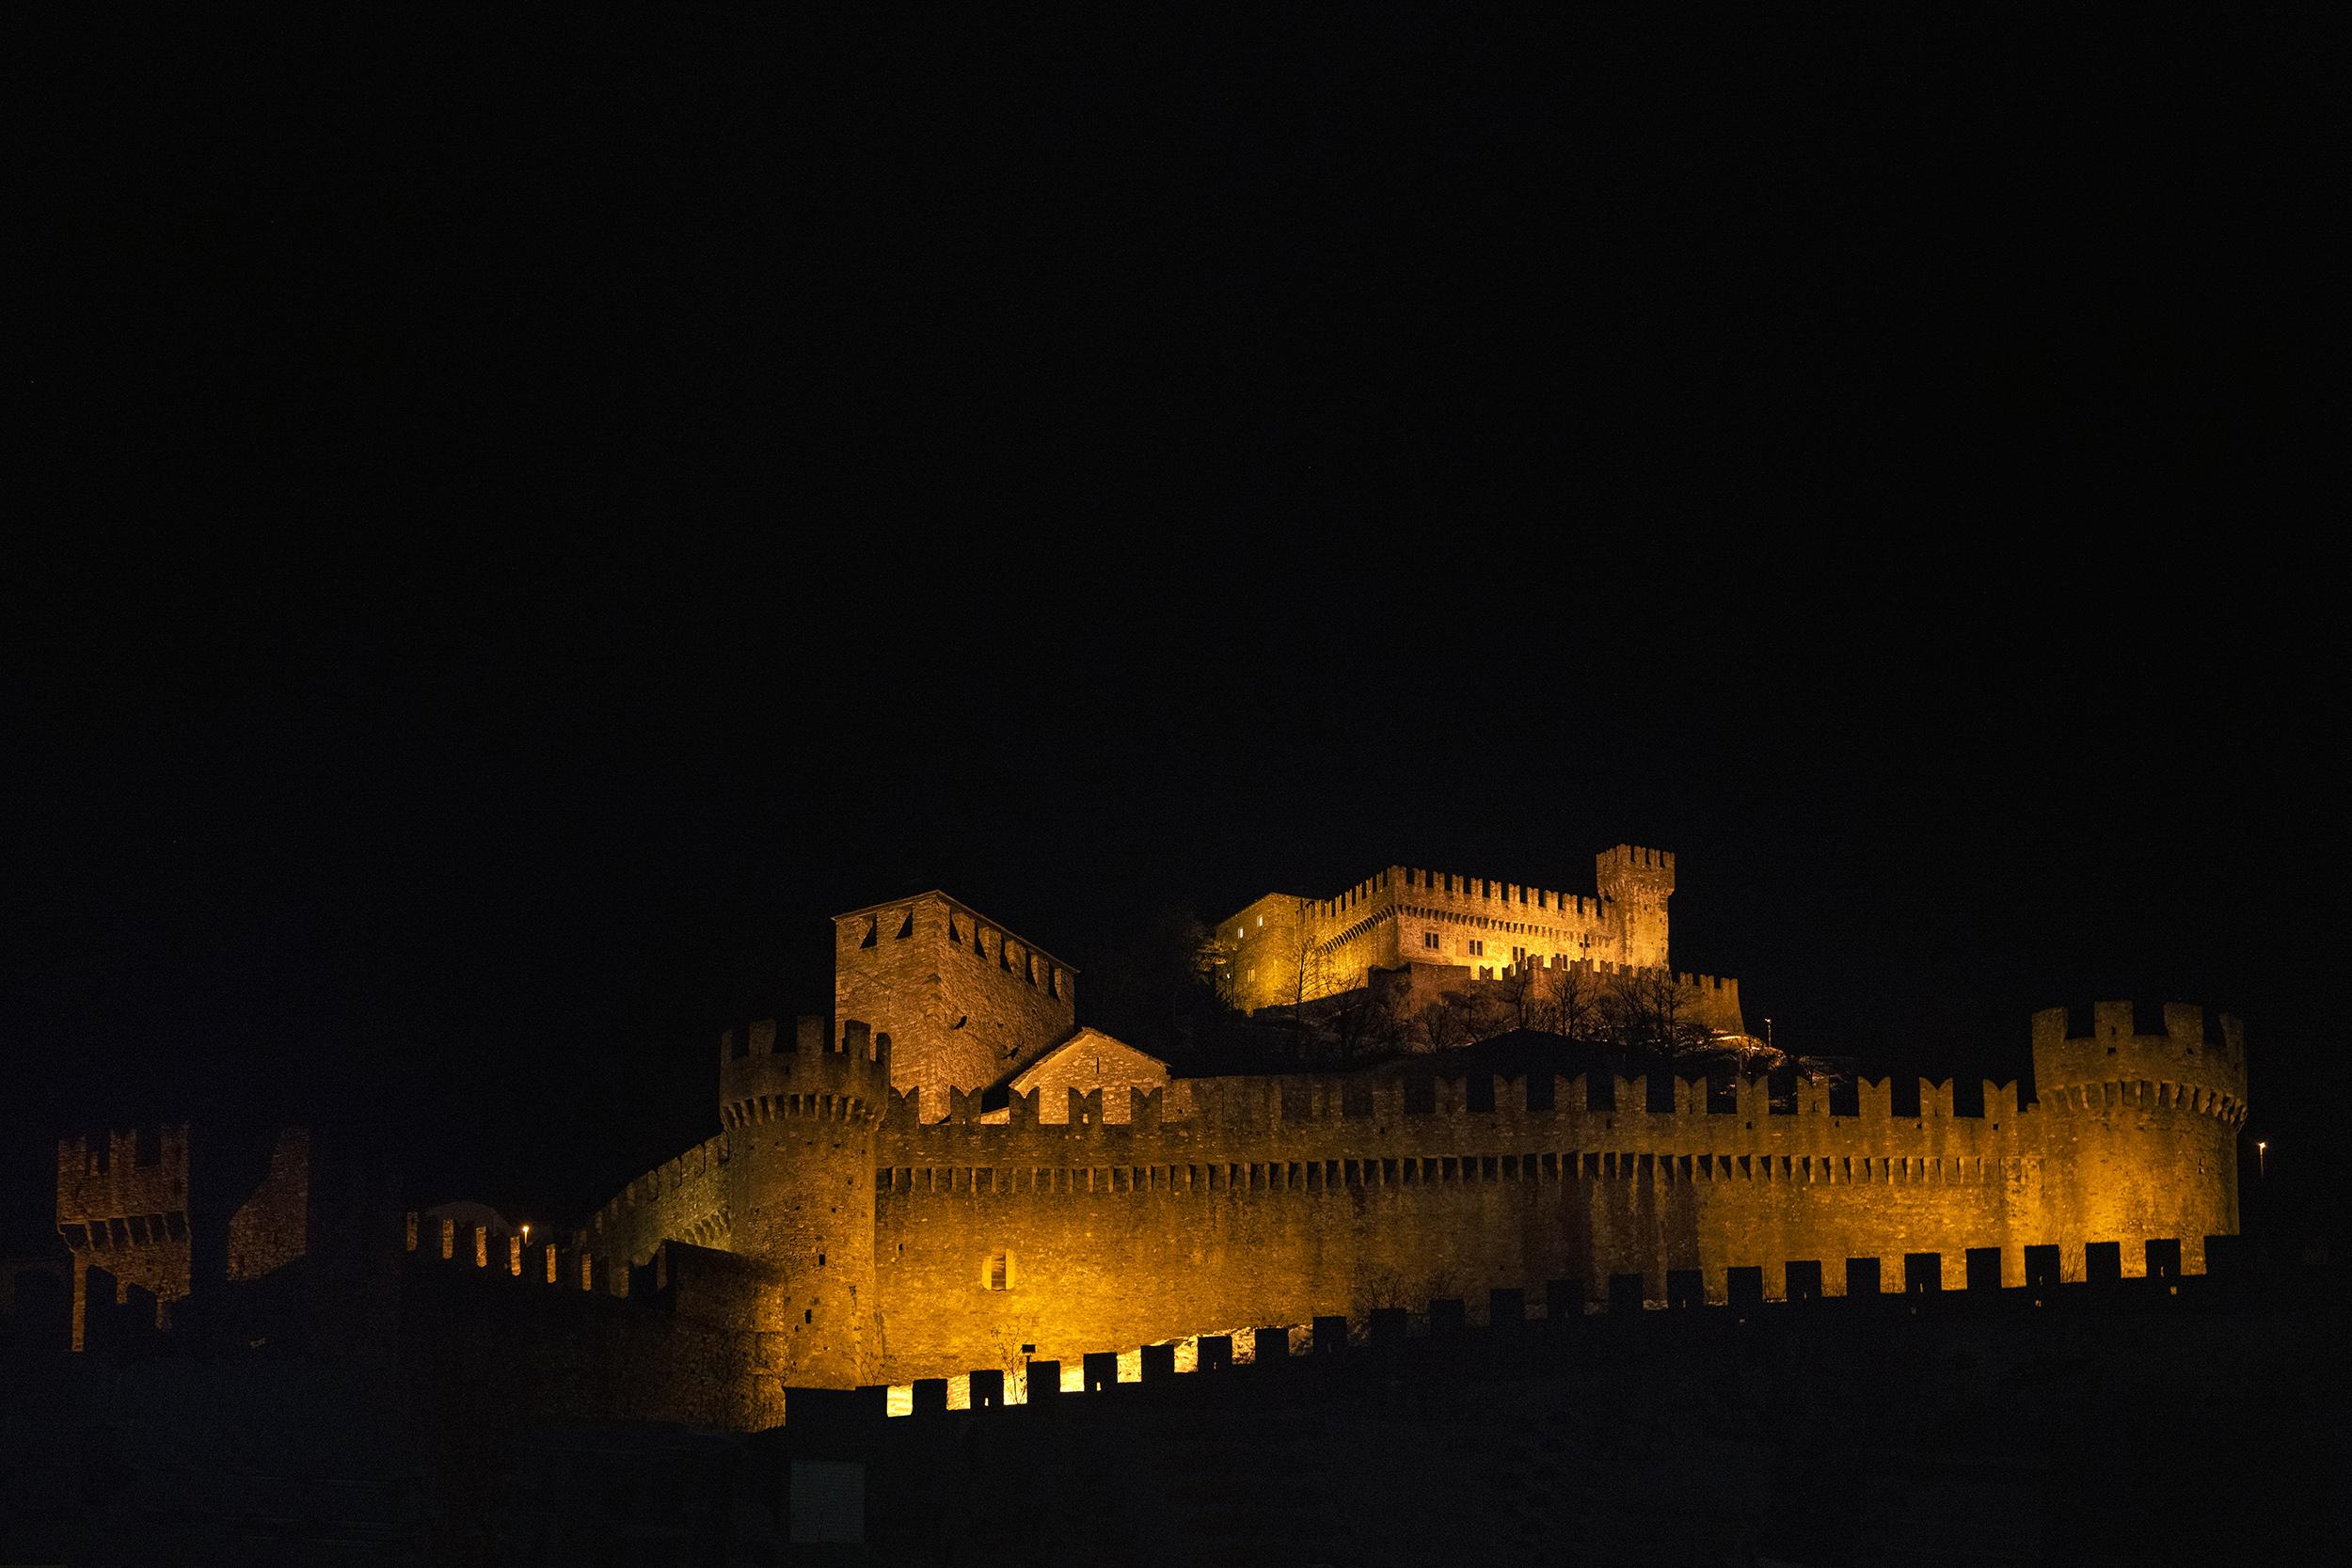 Two Castles-2500px.jpg